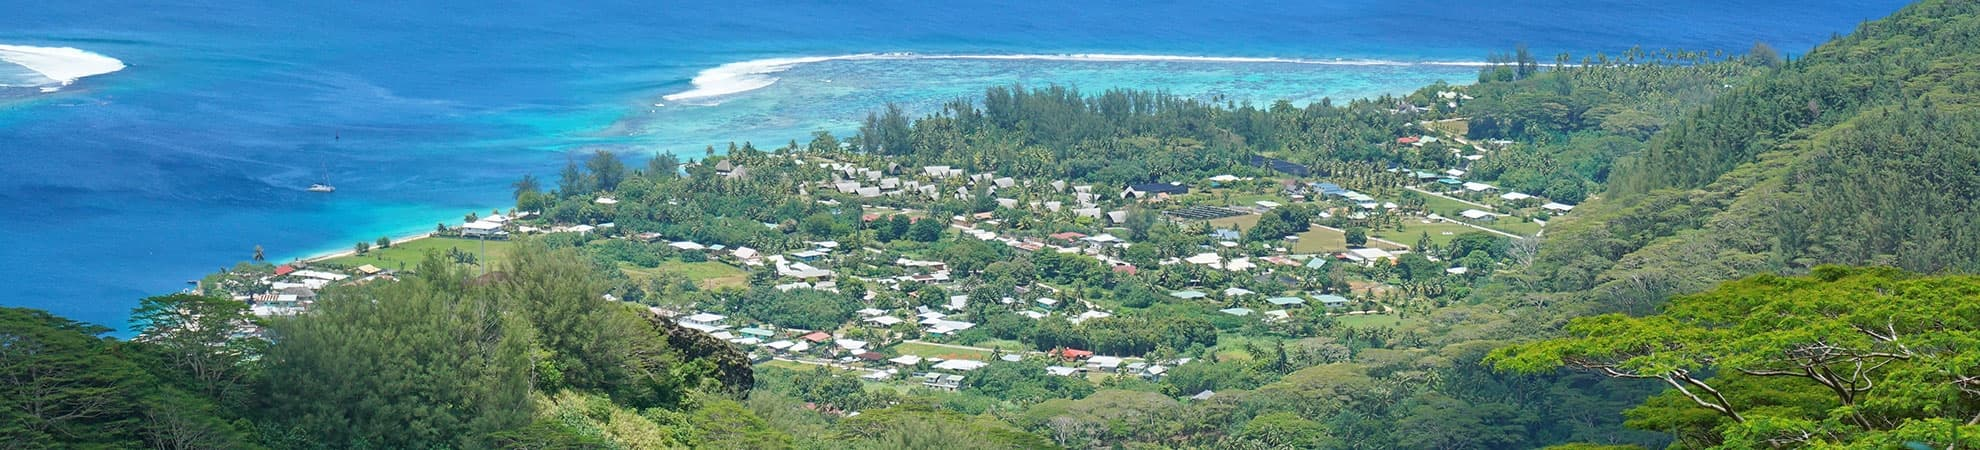 Voyage Huahine